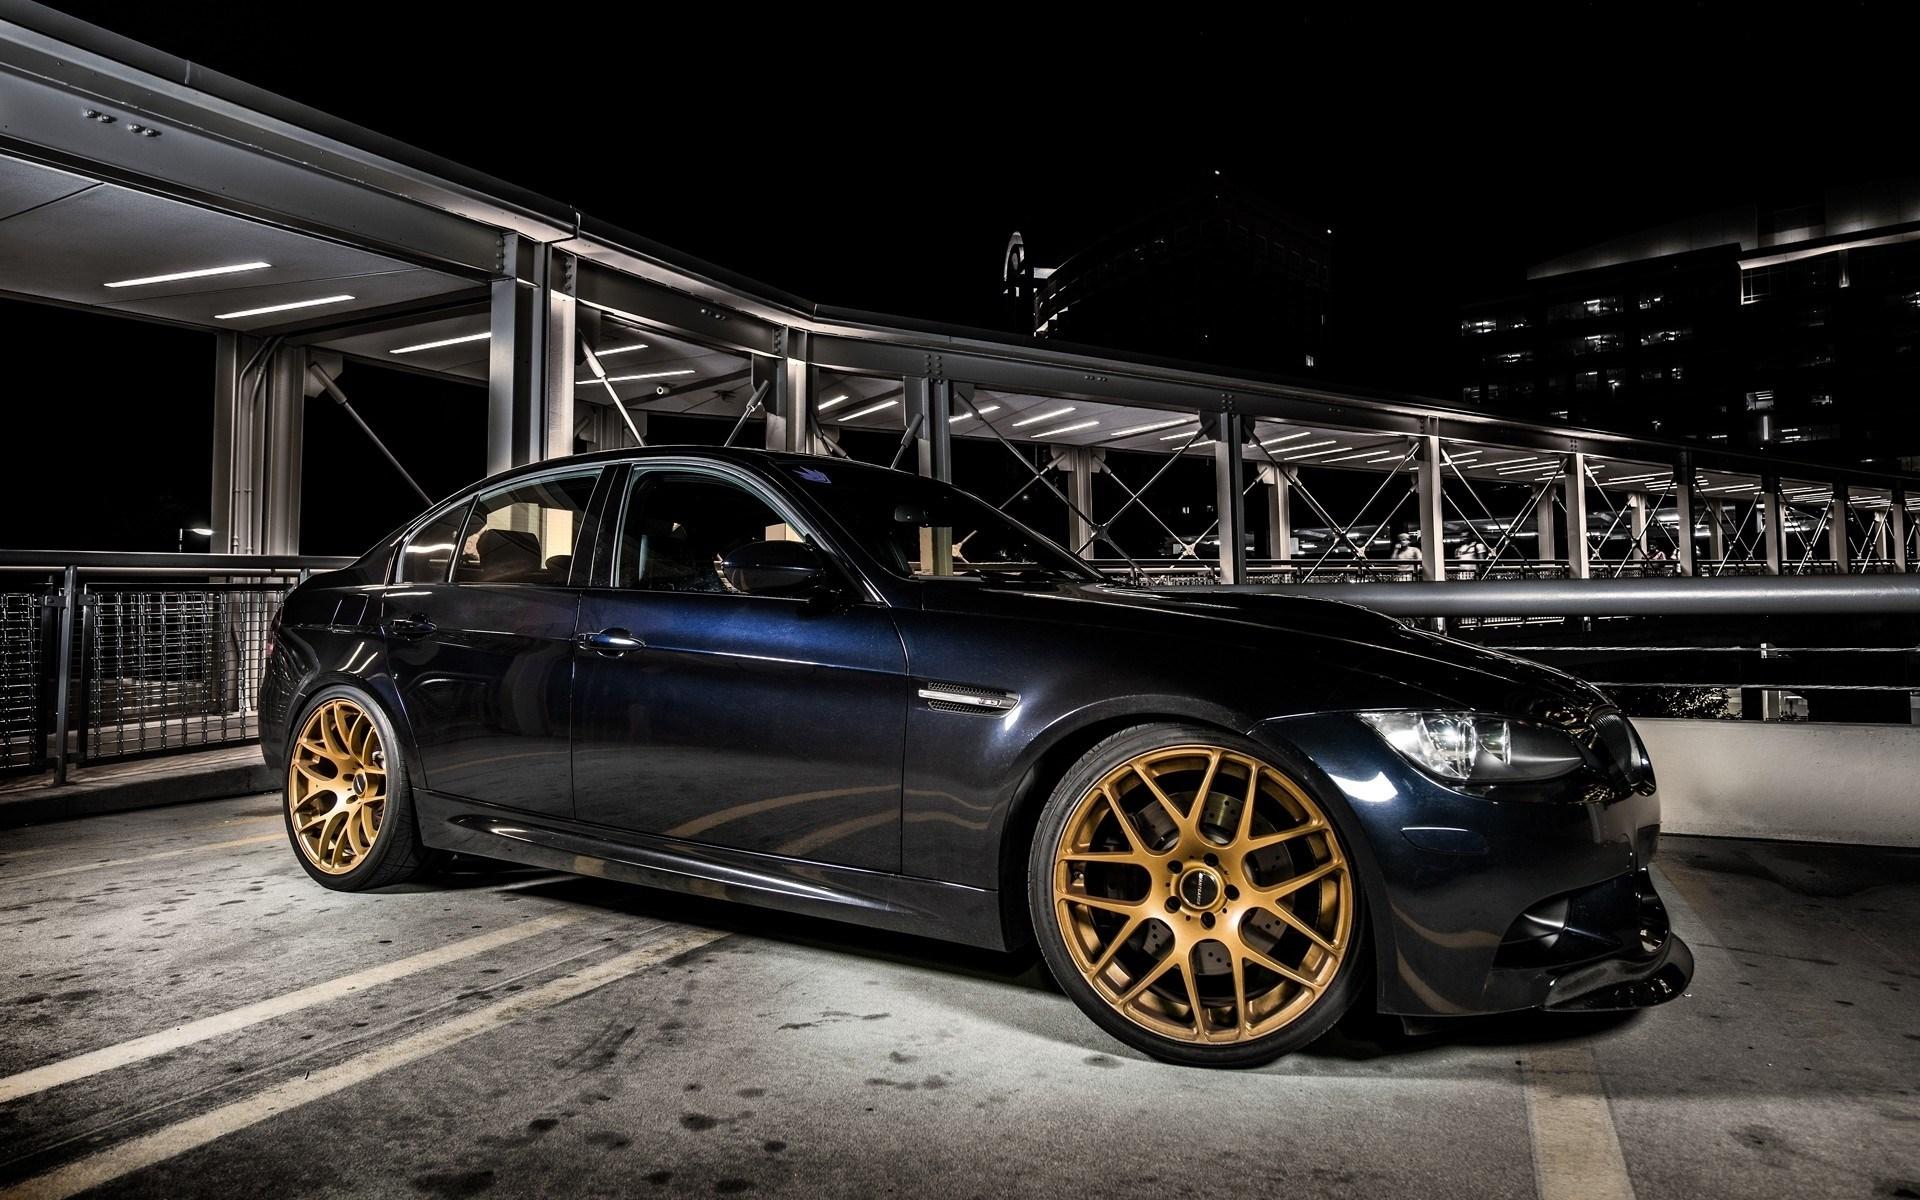 BMW M3 HD Wallpaper | Hintergrund | 1920x1200 | ID:451699 ...